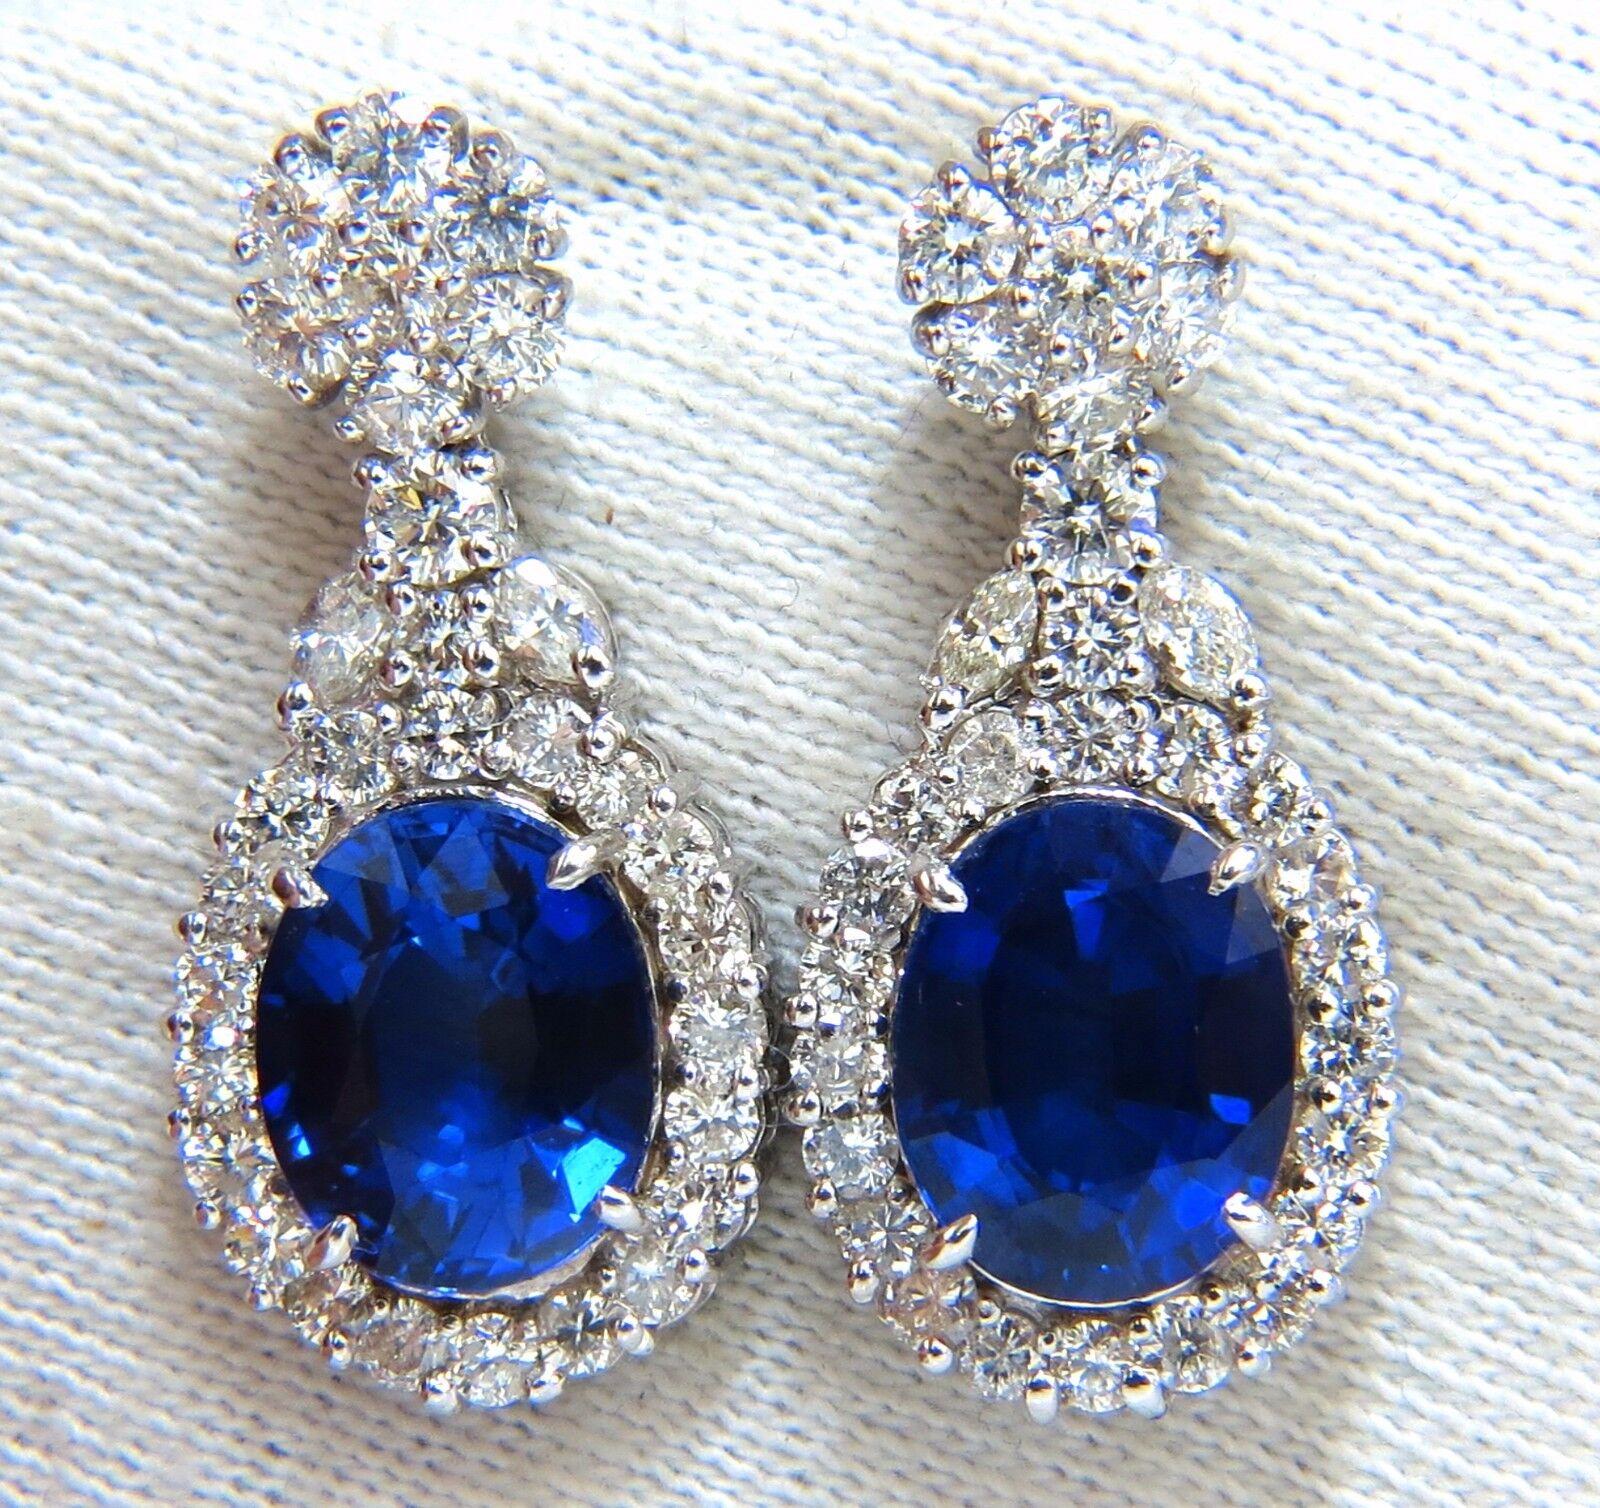 19.00ct Lab Royal blueee Sapphire Diamonds Dangle Earrings 14kt.